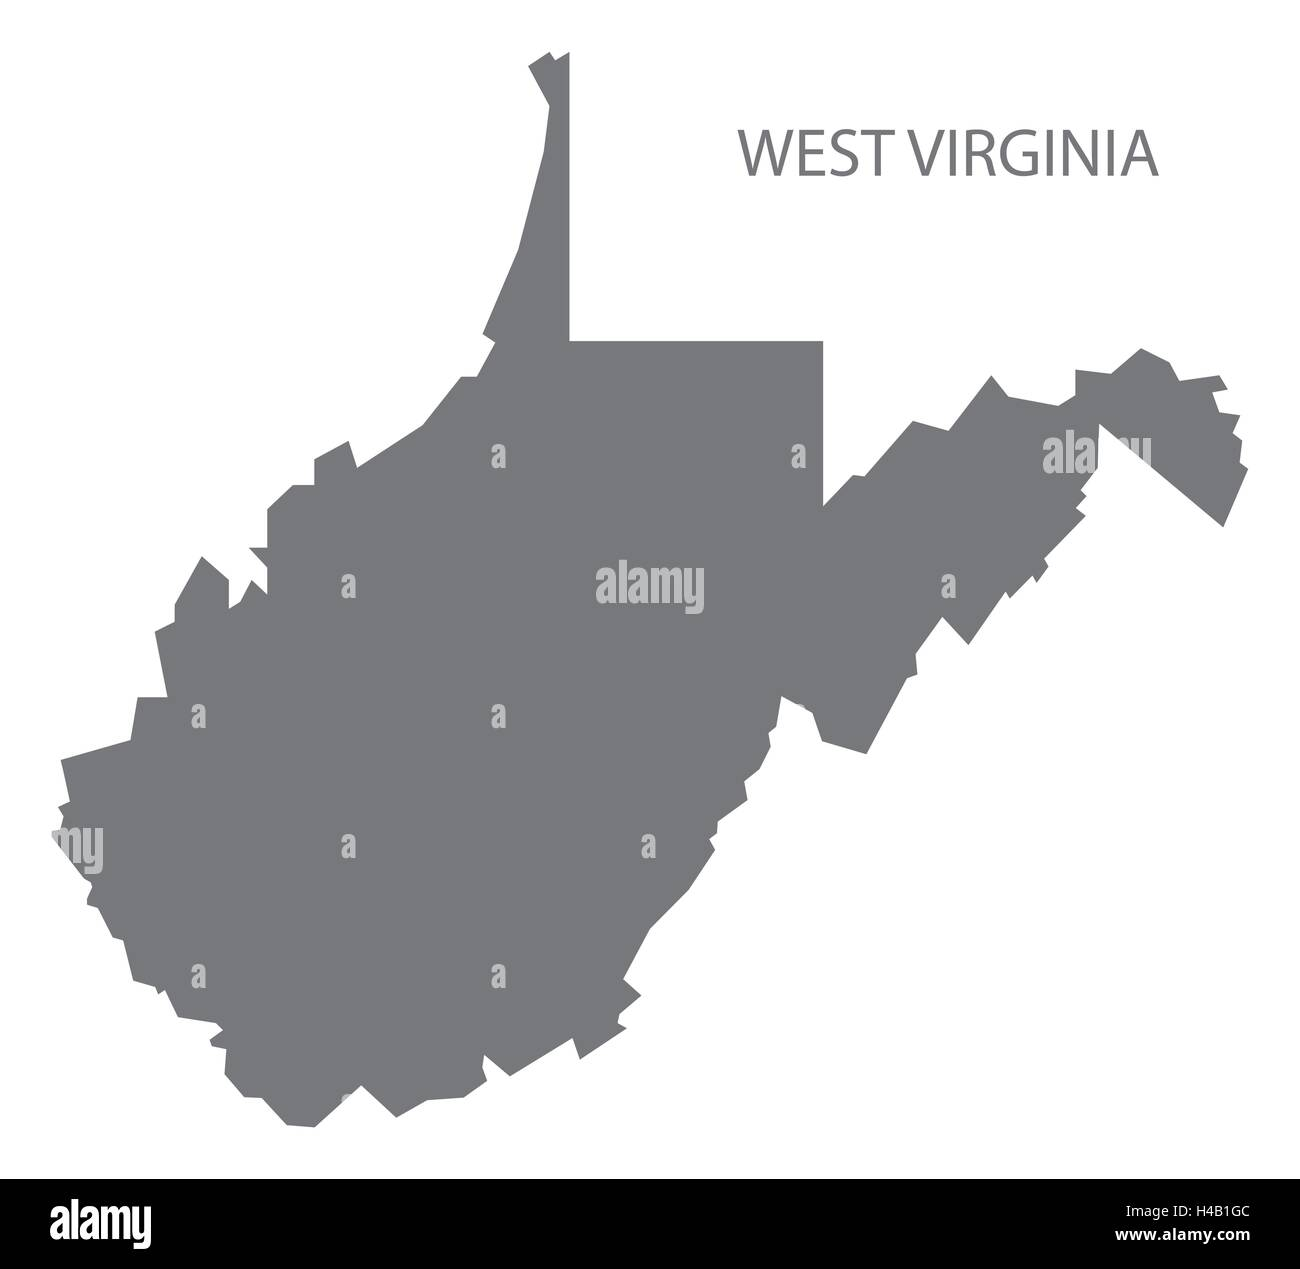 West Virginia USA Map In Grey Stock Vector Art Illustration - West virginia us map